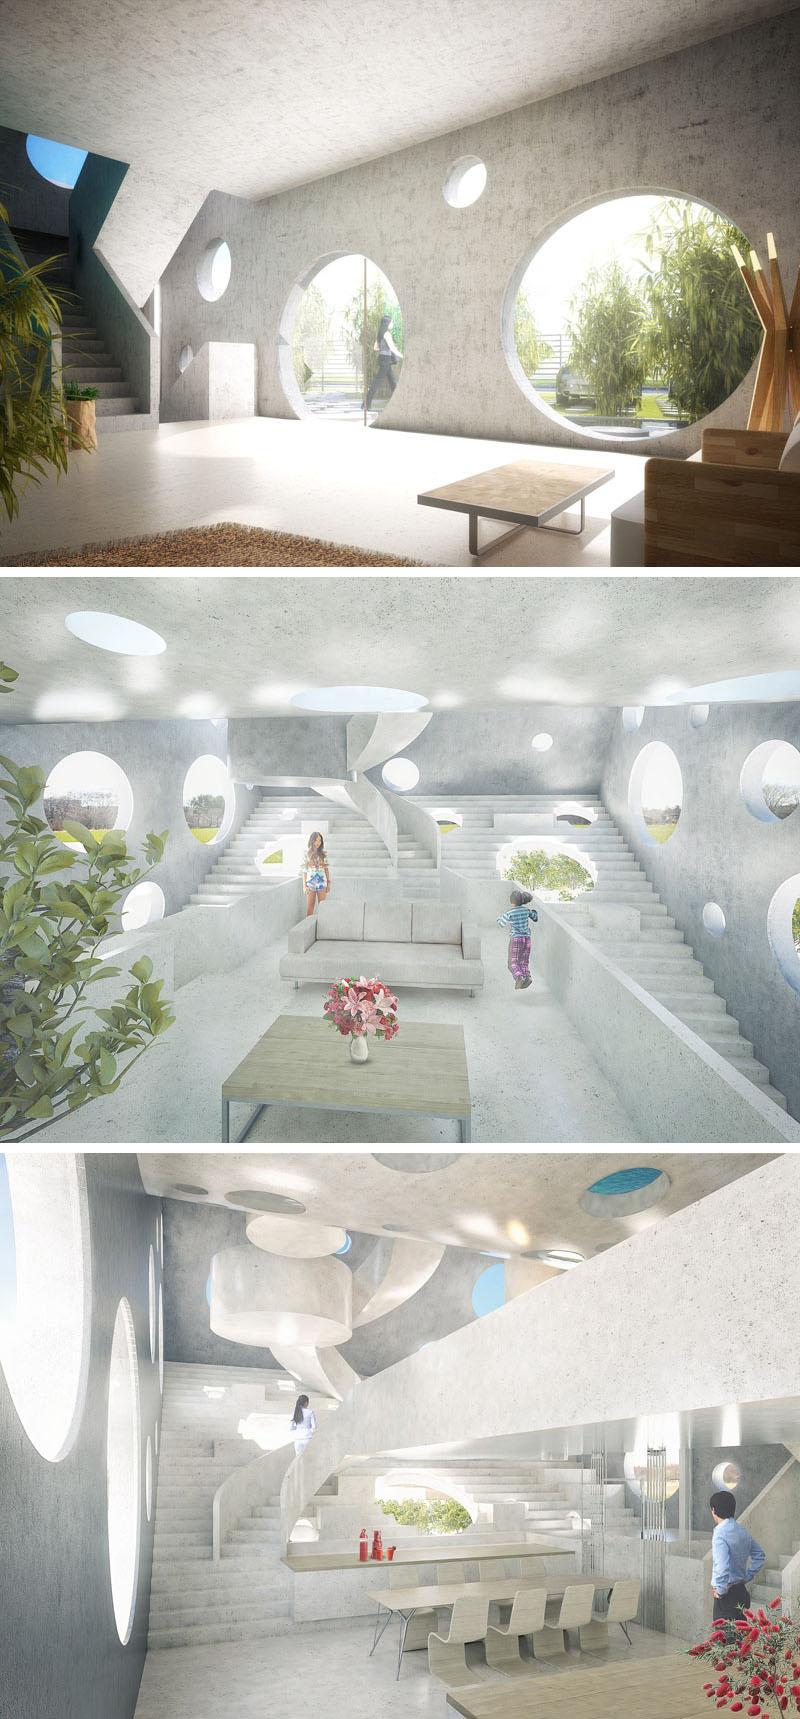 concept-house-design-011216-1226-04